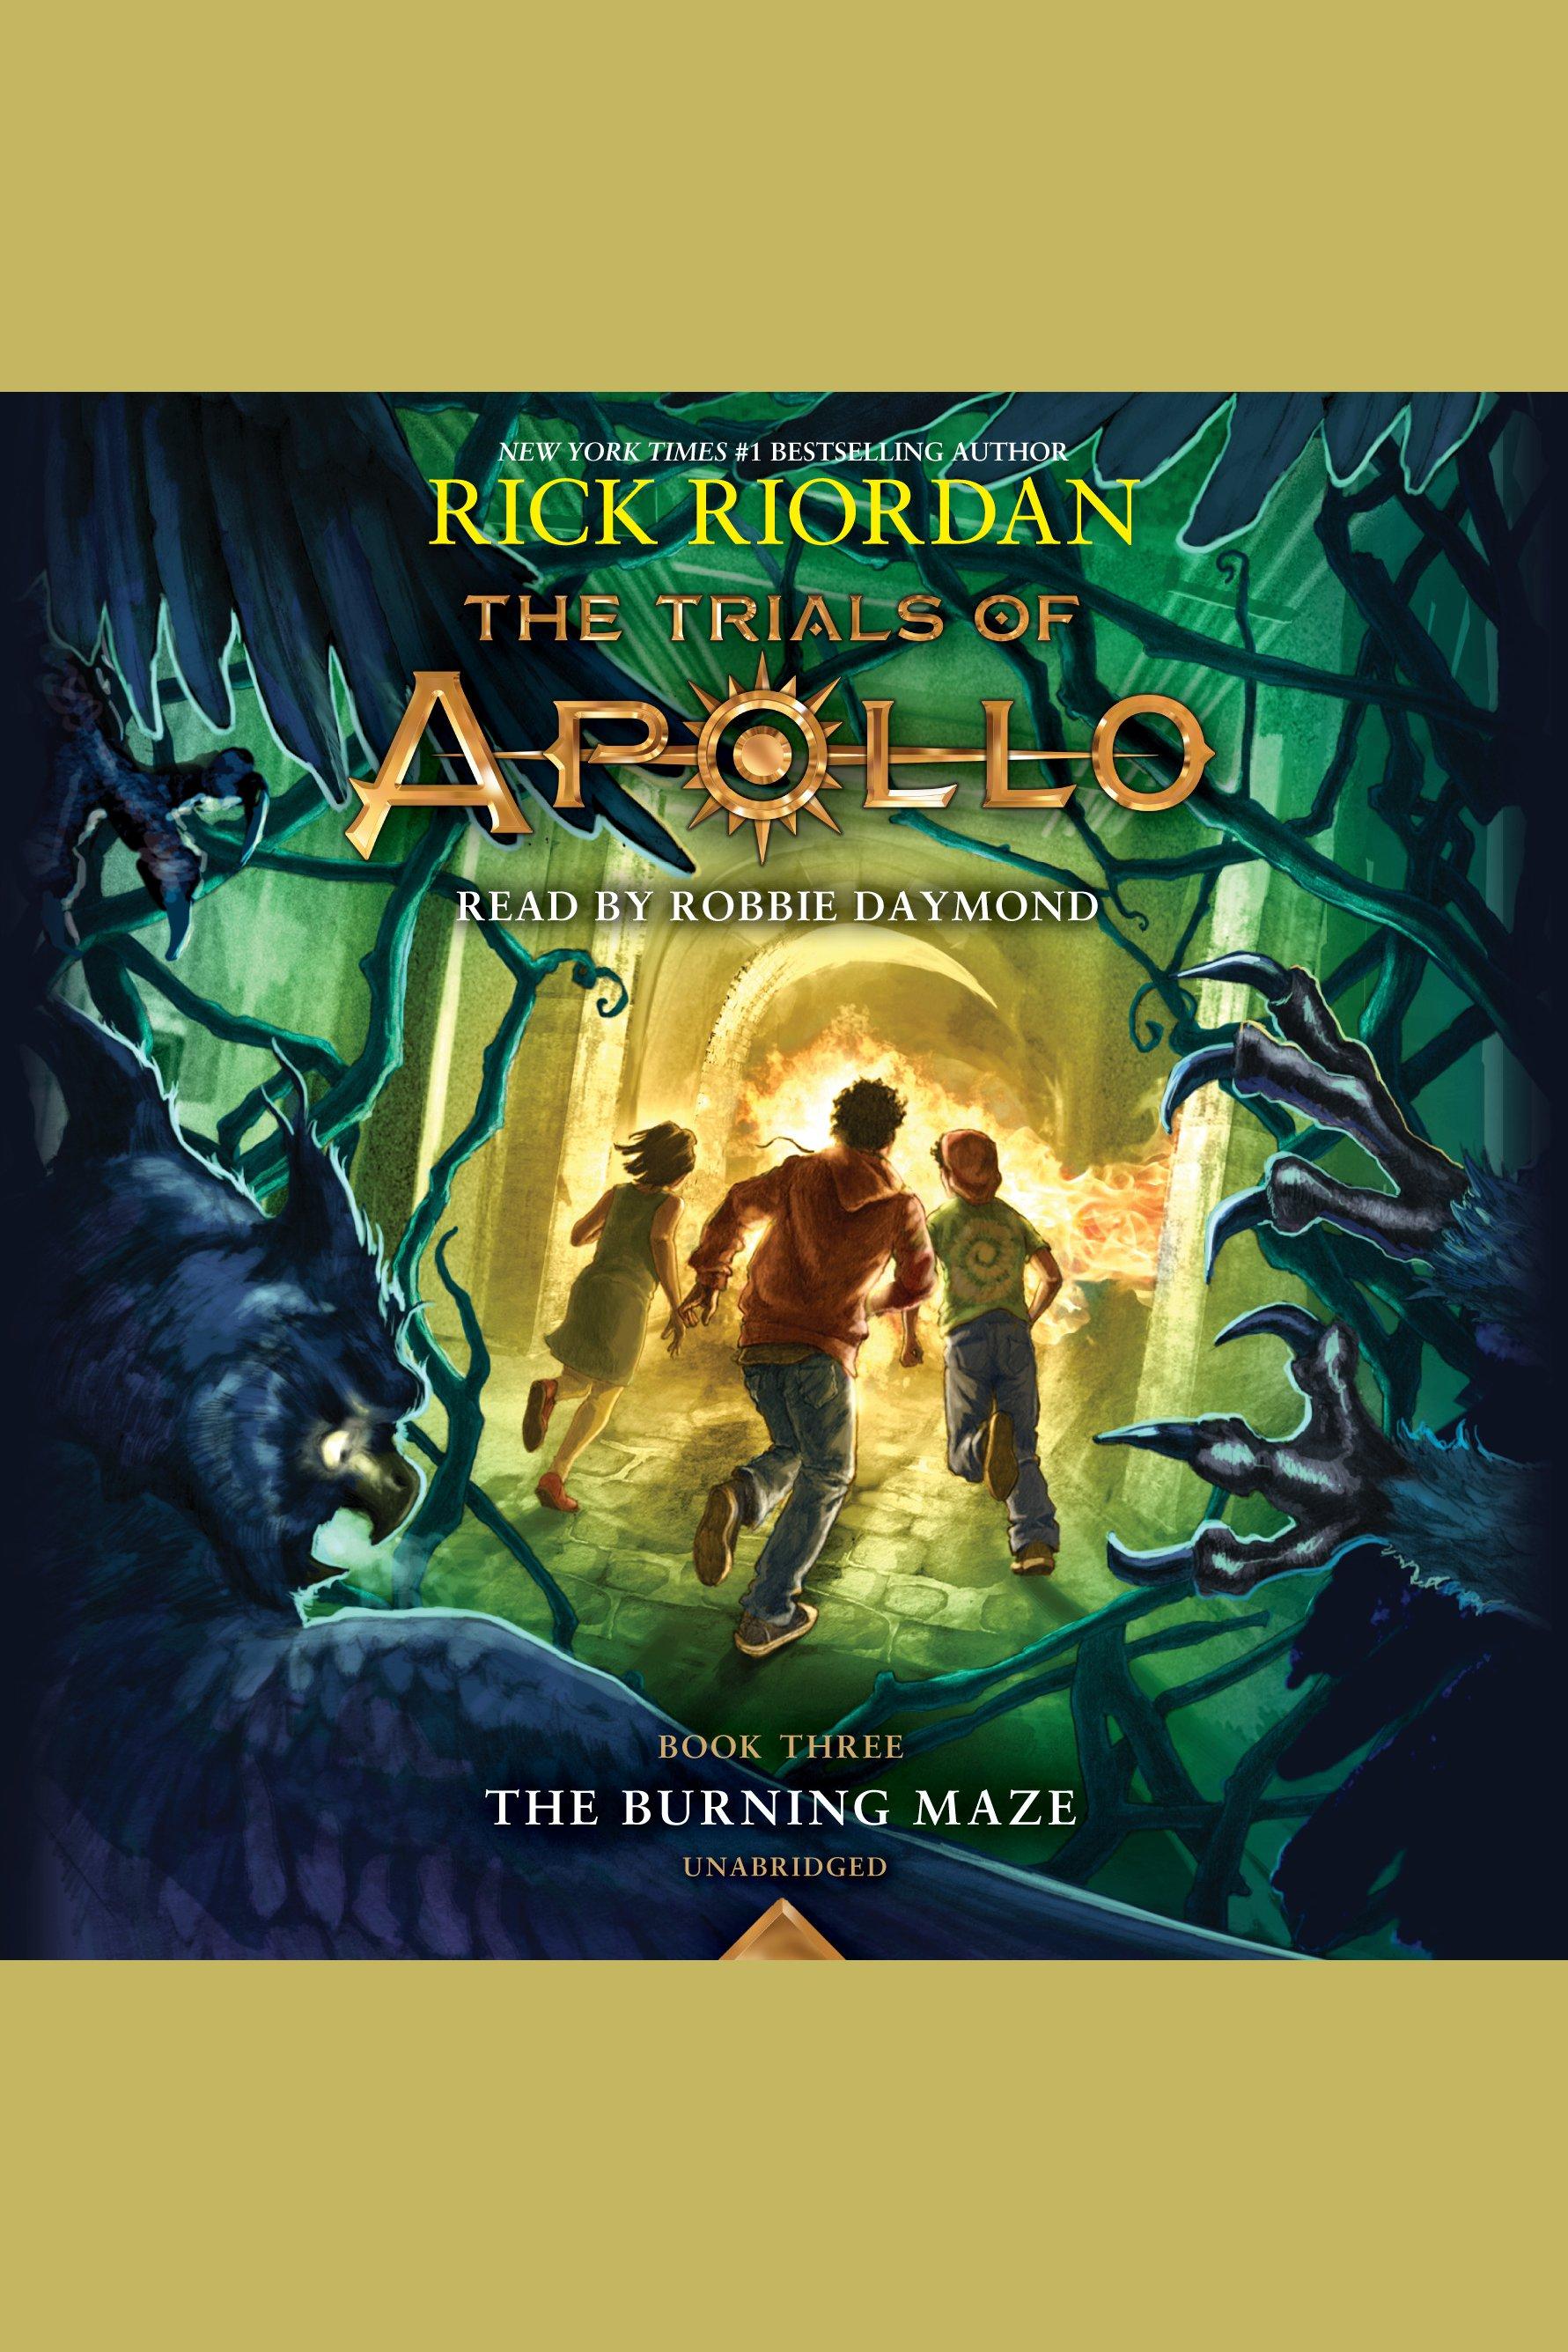 The Burning Maze The Trials of Apollo, Book 3